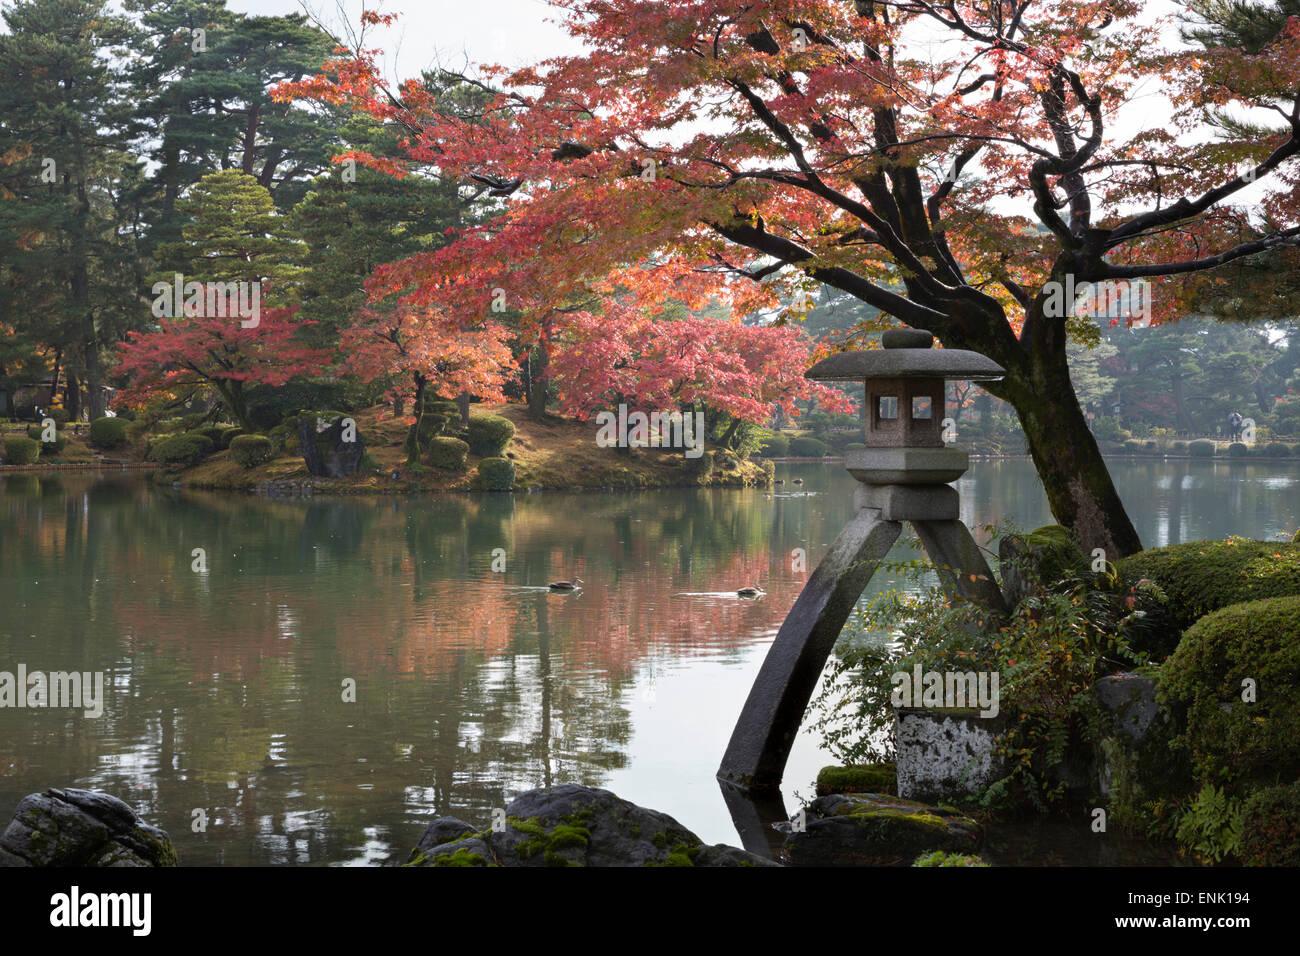 Avec Jardin Kenrokuen lanterne Kotojitoro en automne, Kanazawa, Ishikawa Prefecture, Honshu central, le Japon, l'Asie Photo Stock